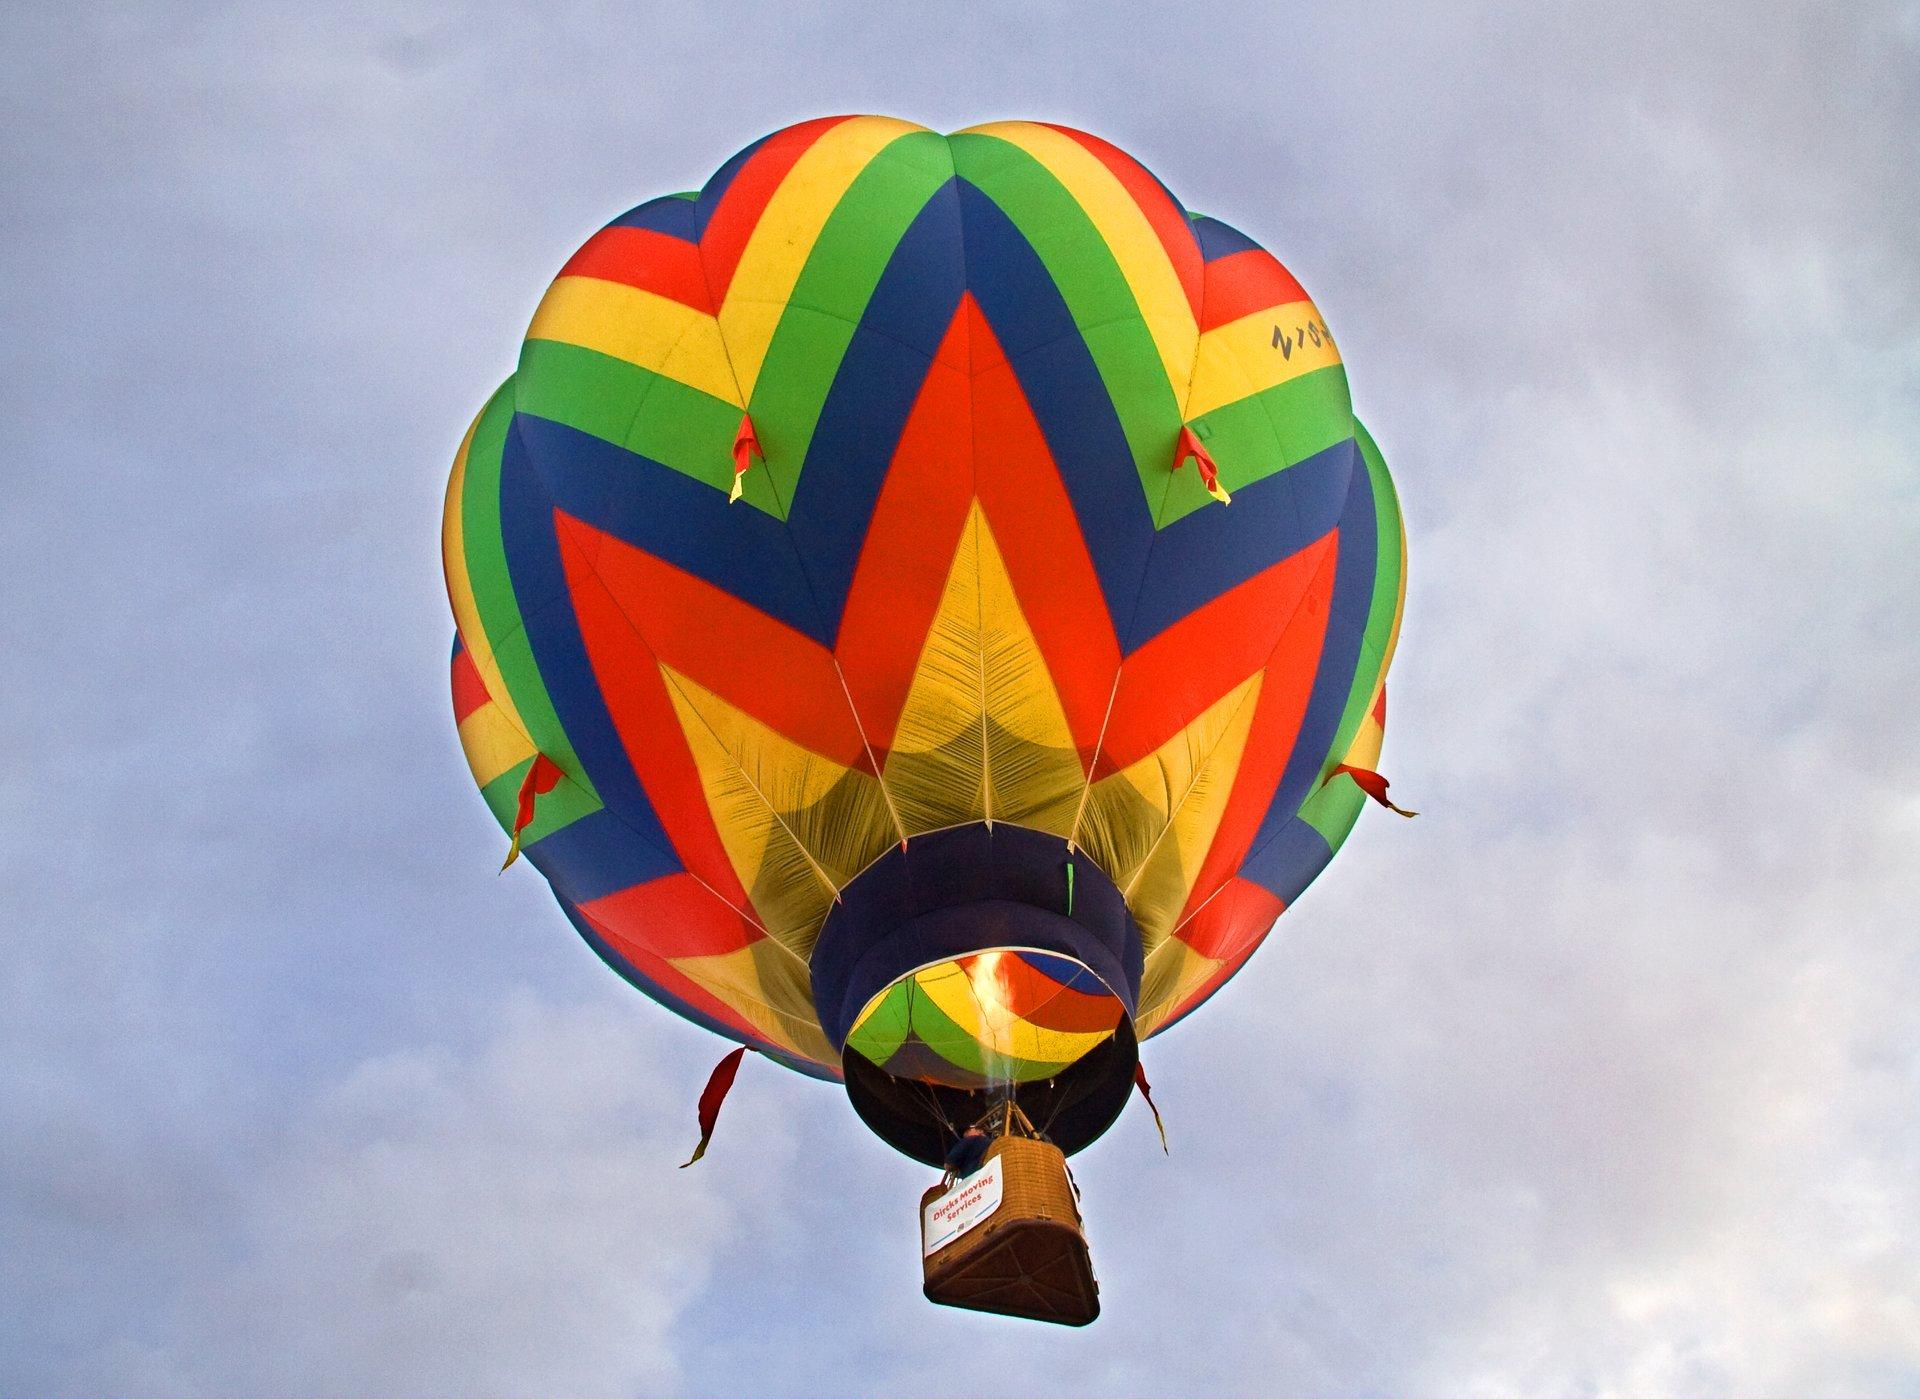 Arizona Balloon Classic in Arizona 2020 - Best Time